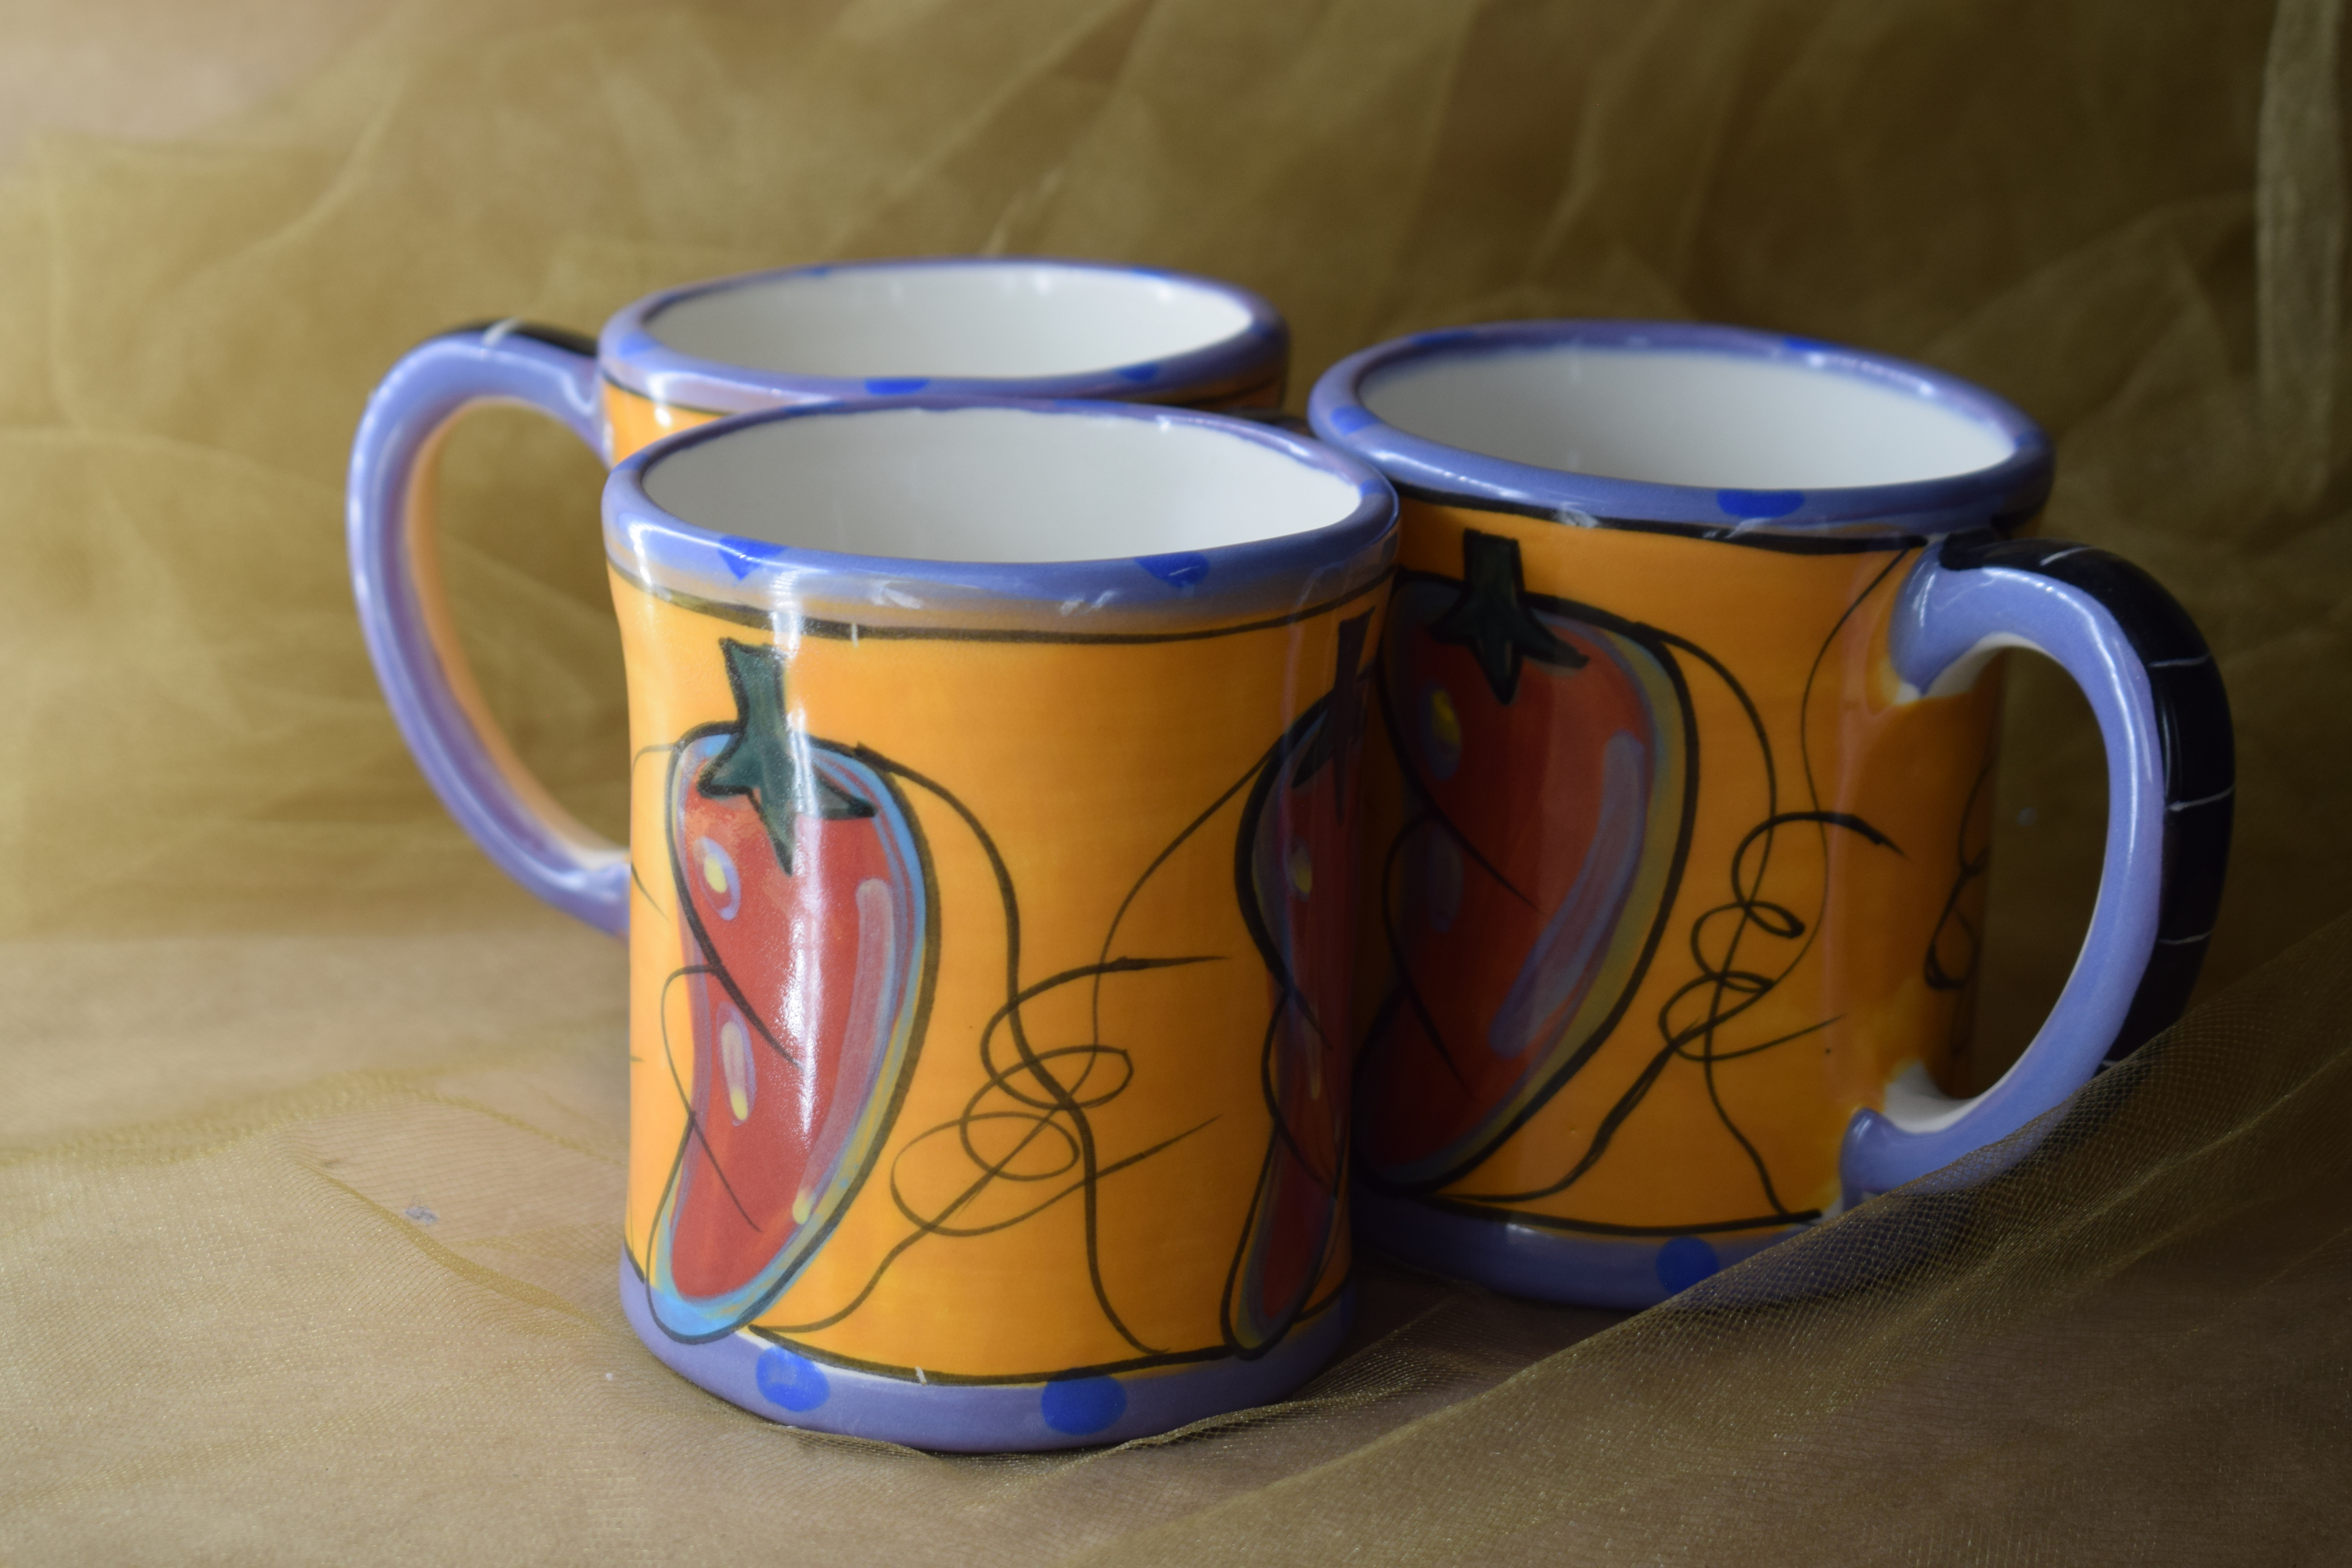 (LM02-CP) 12oz. Mug- Chile Pachanga